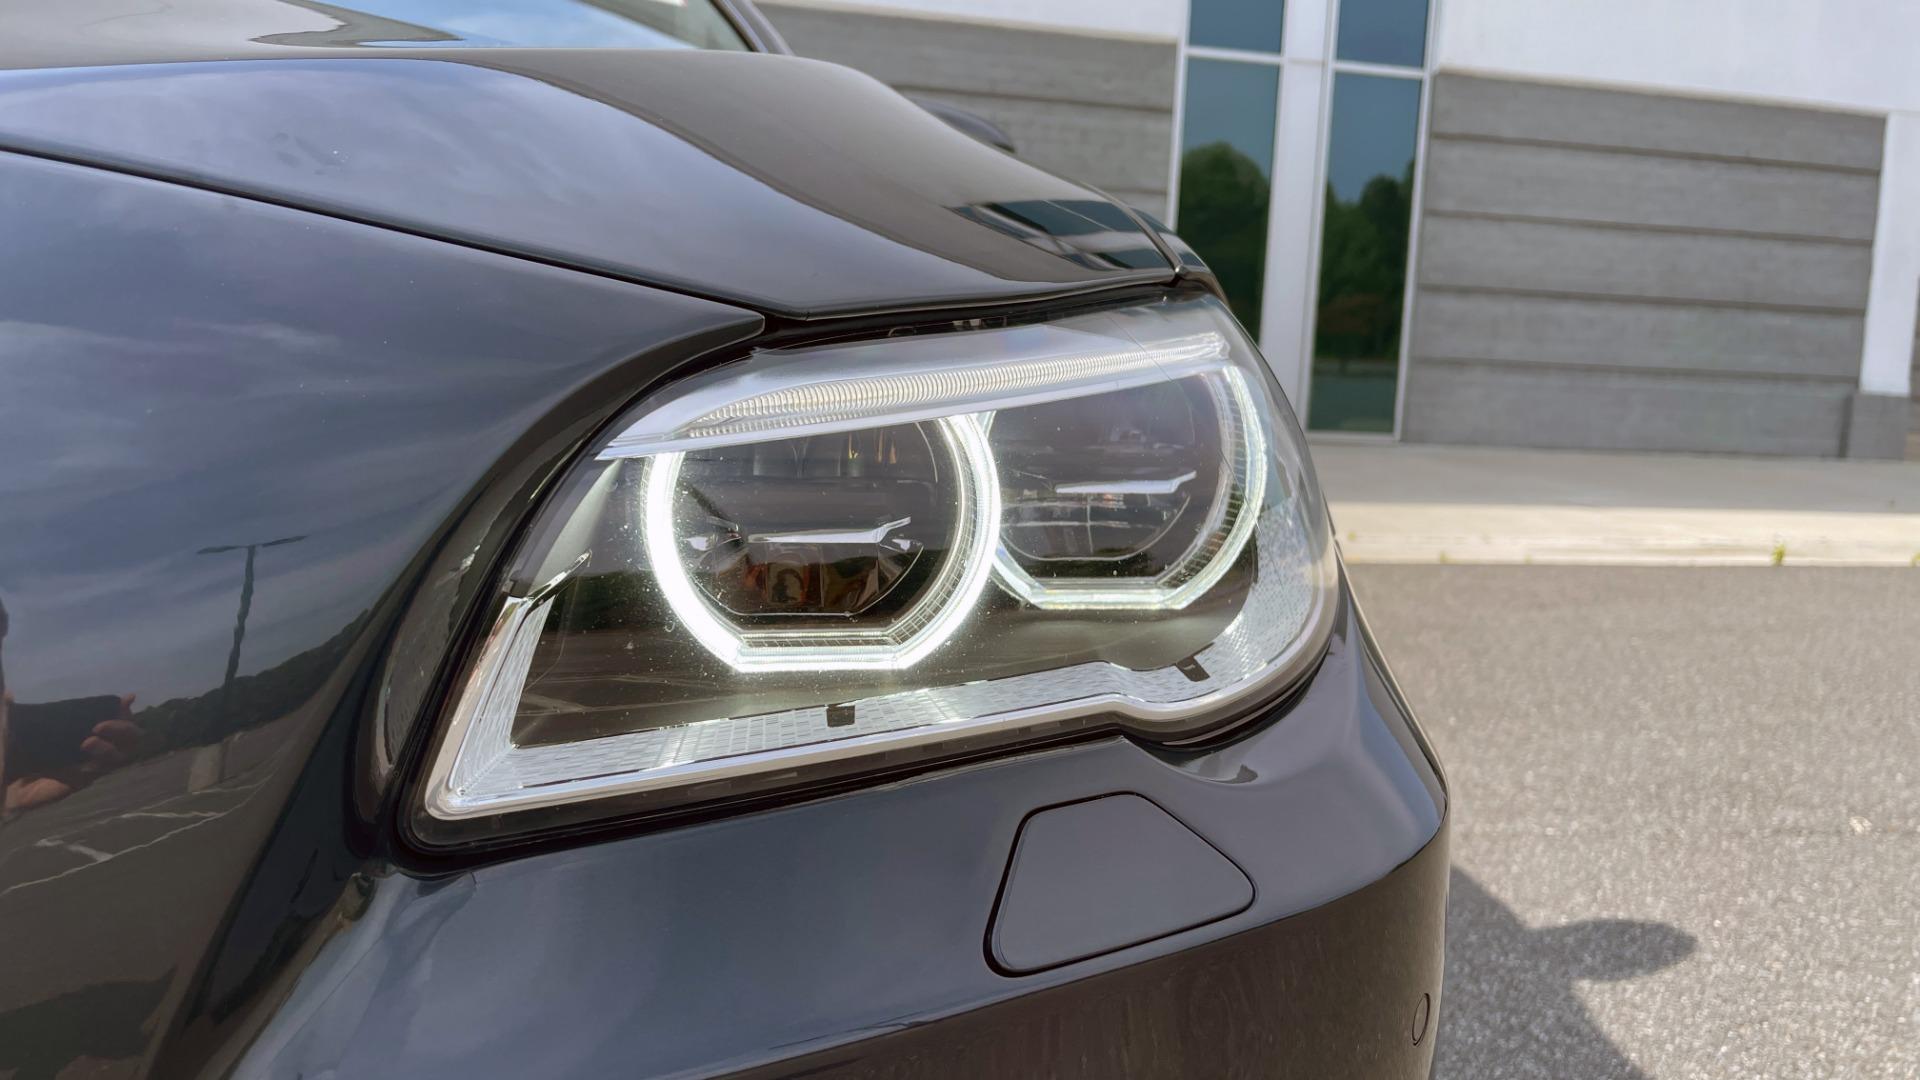 Used 2015 BMW M5 SEDAN / EXEC PKG / HUD / NAV / B&O SND / SUNROOF / REARVIEW for sale Sold at Formula Imports in Charlotte NC 28227 16